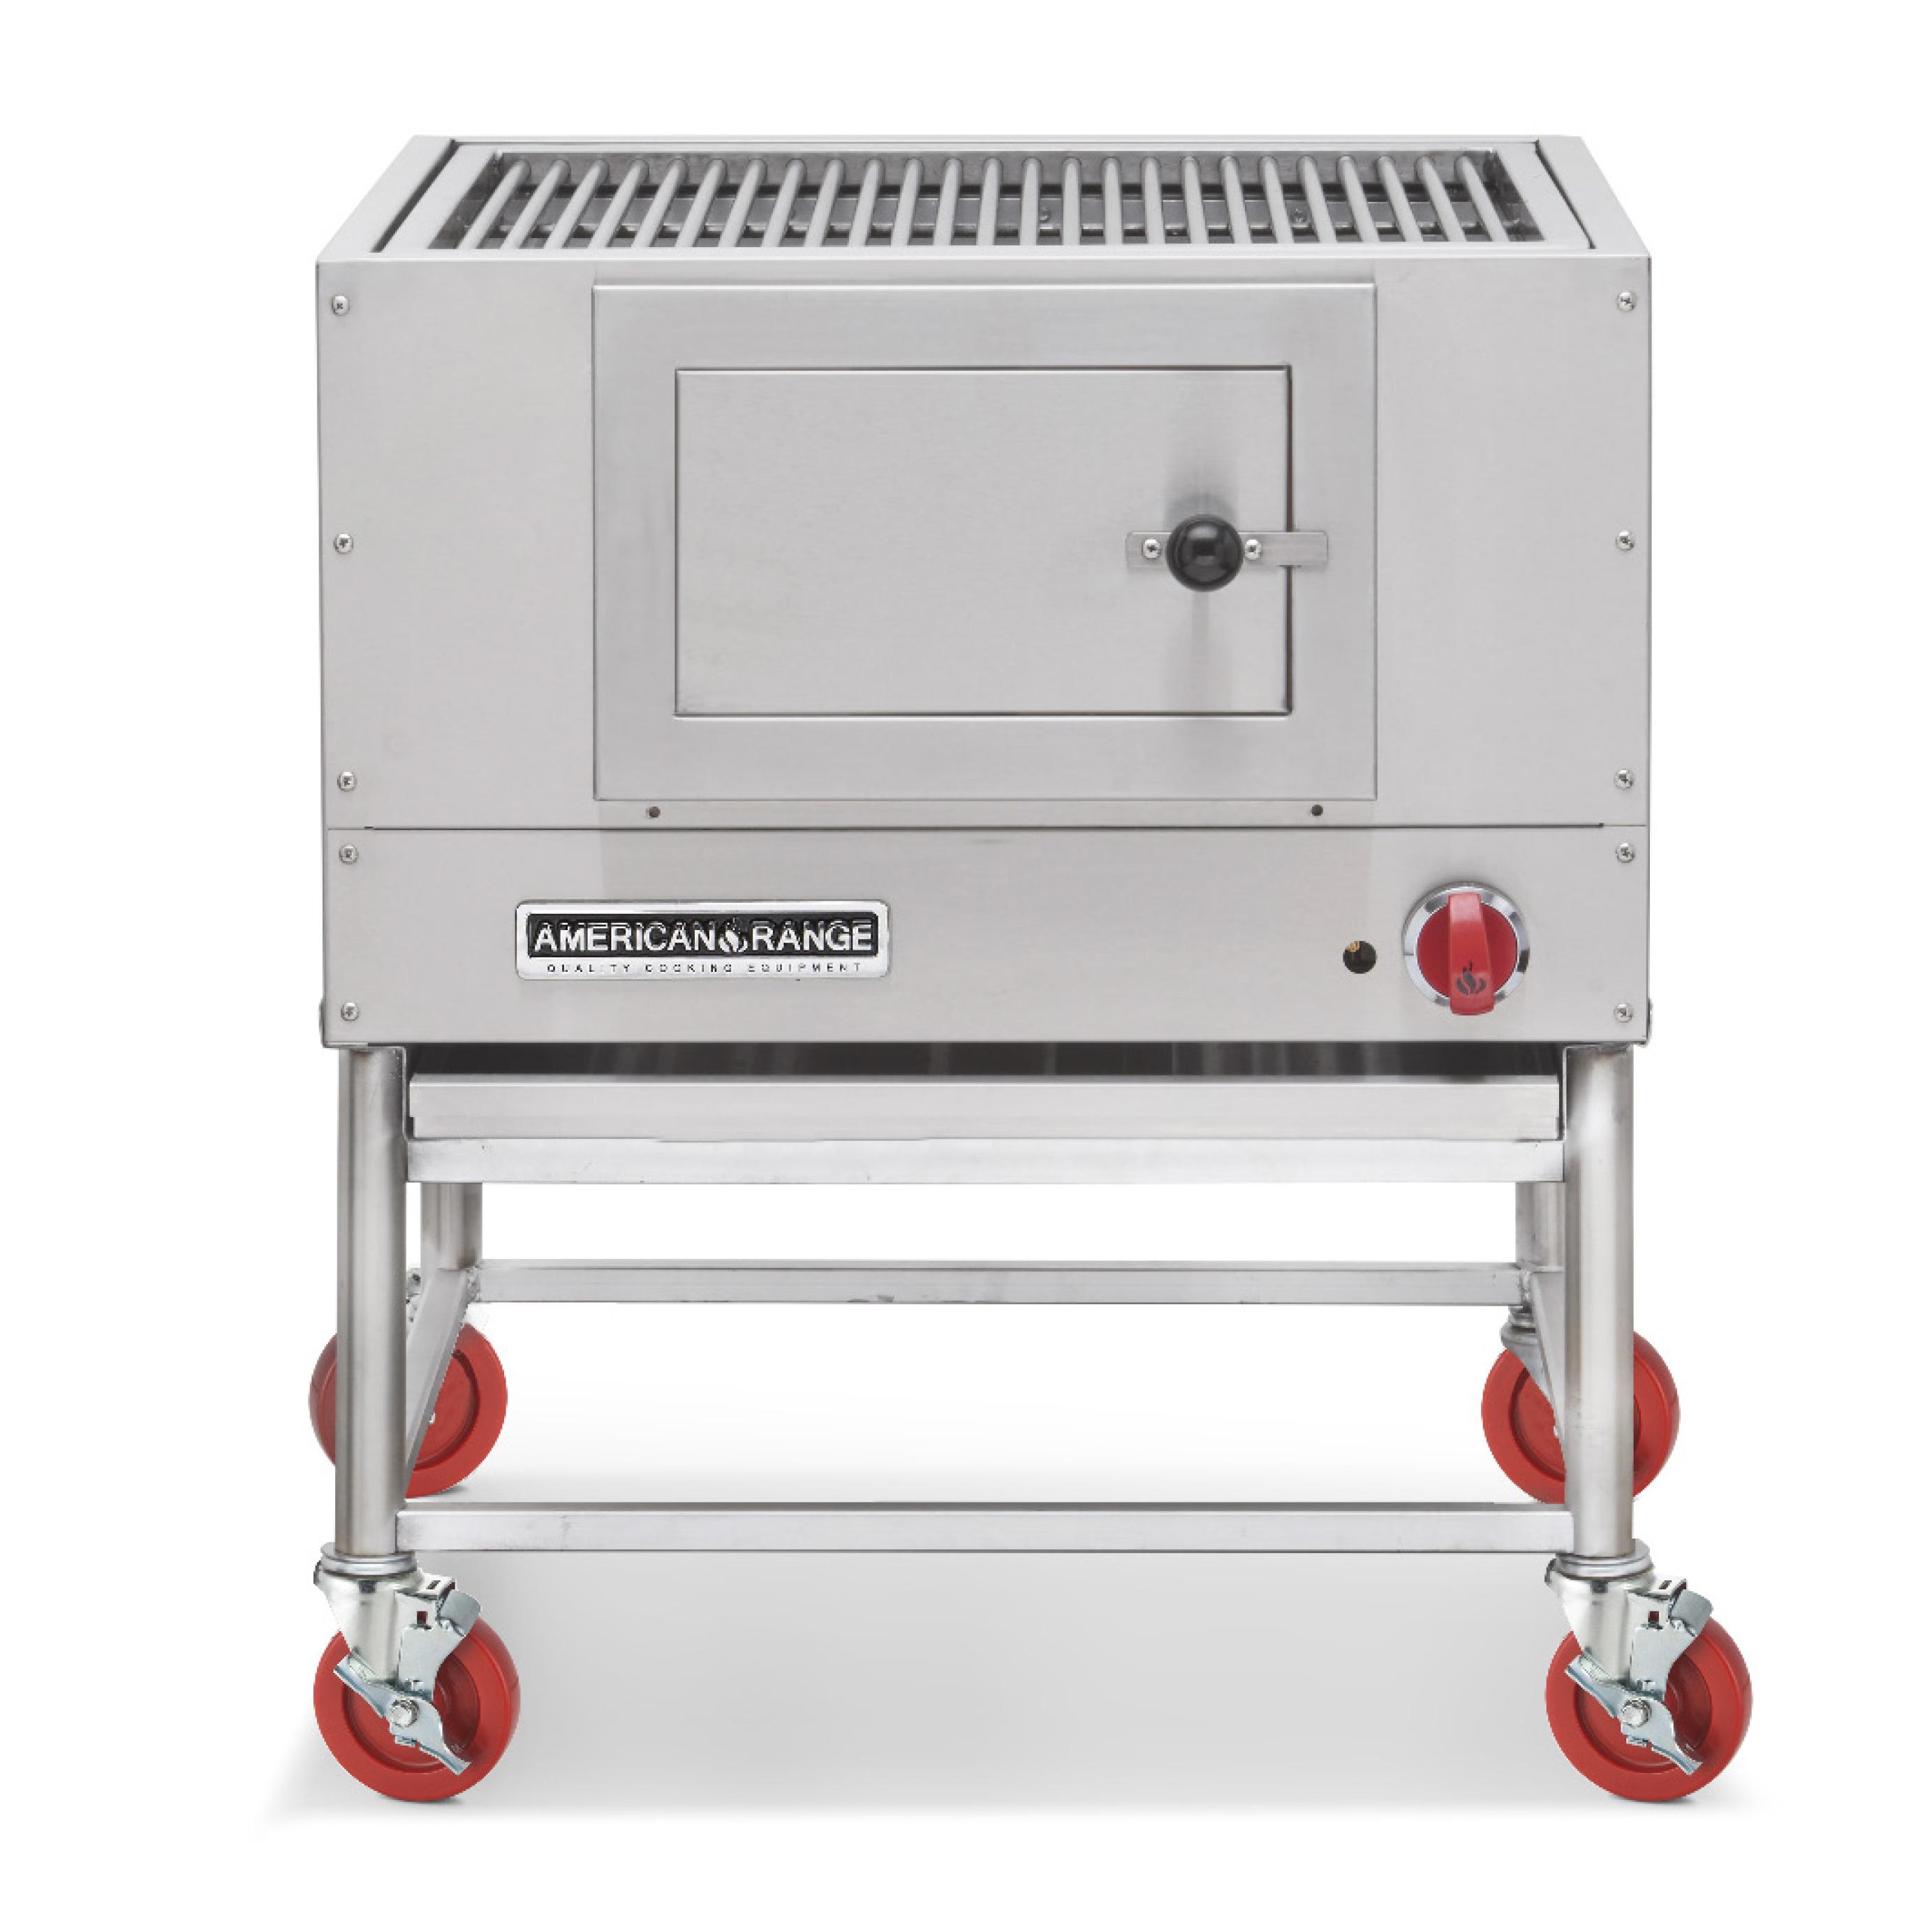 American Range AMSQ-36 charbroiler, wood burning